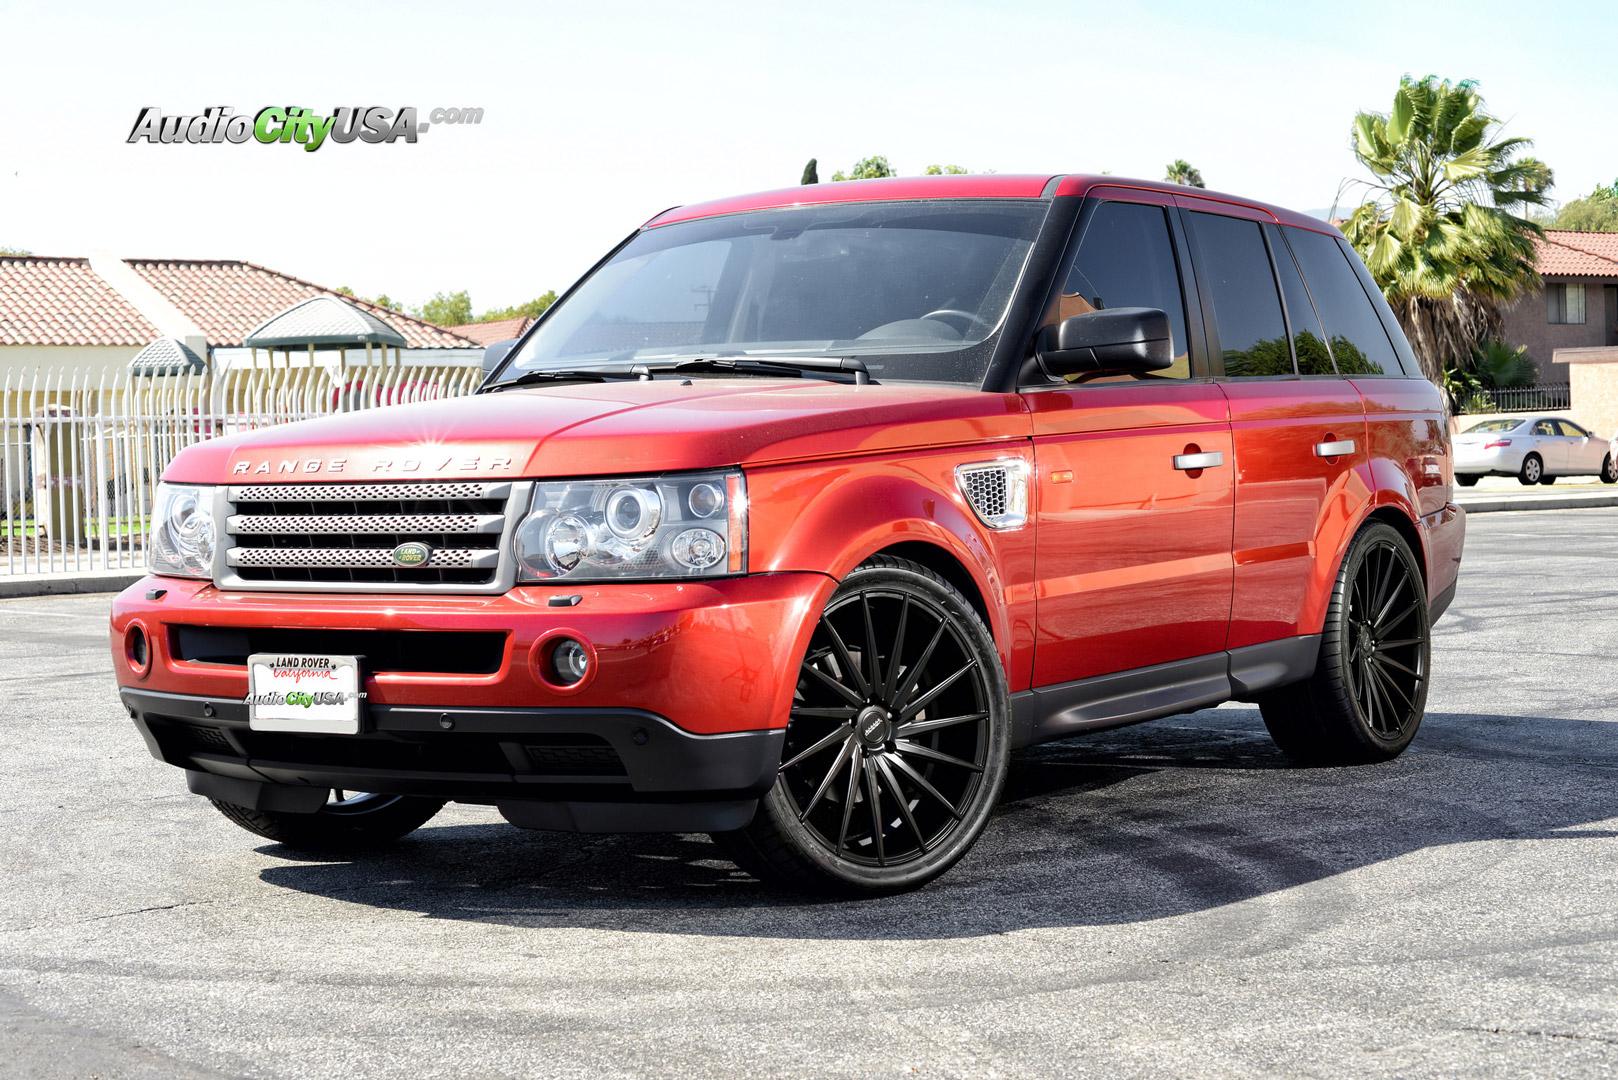 Range Rover Sport Black Rims - Varro VD15 Wheels